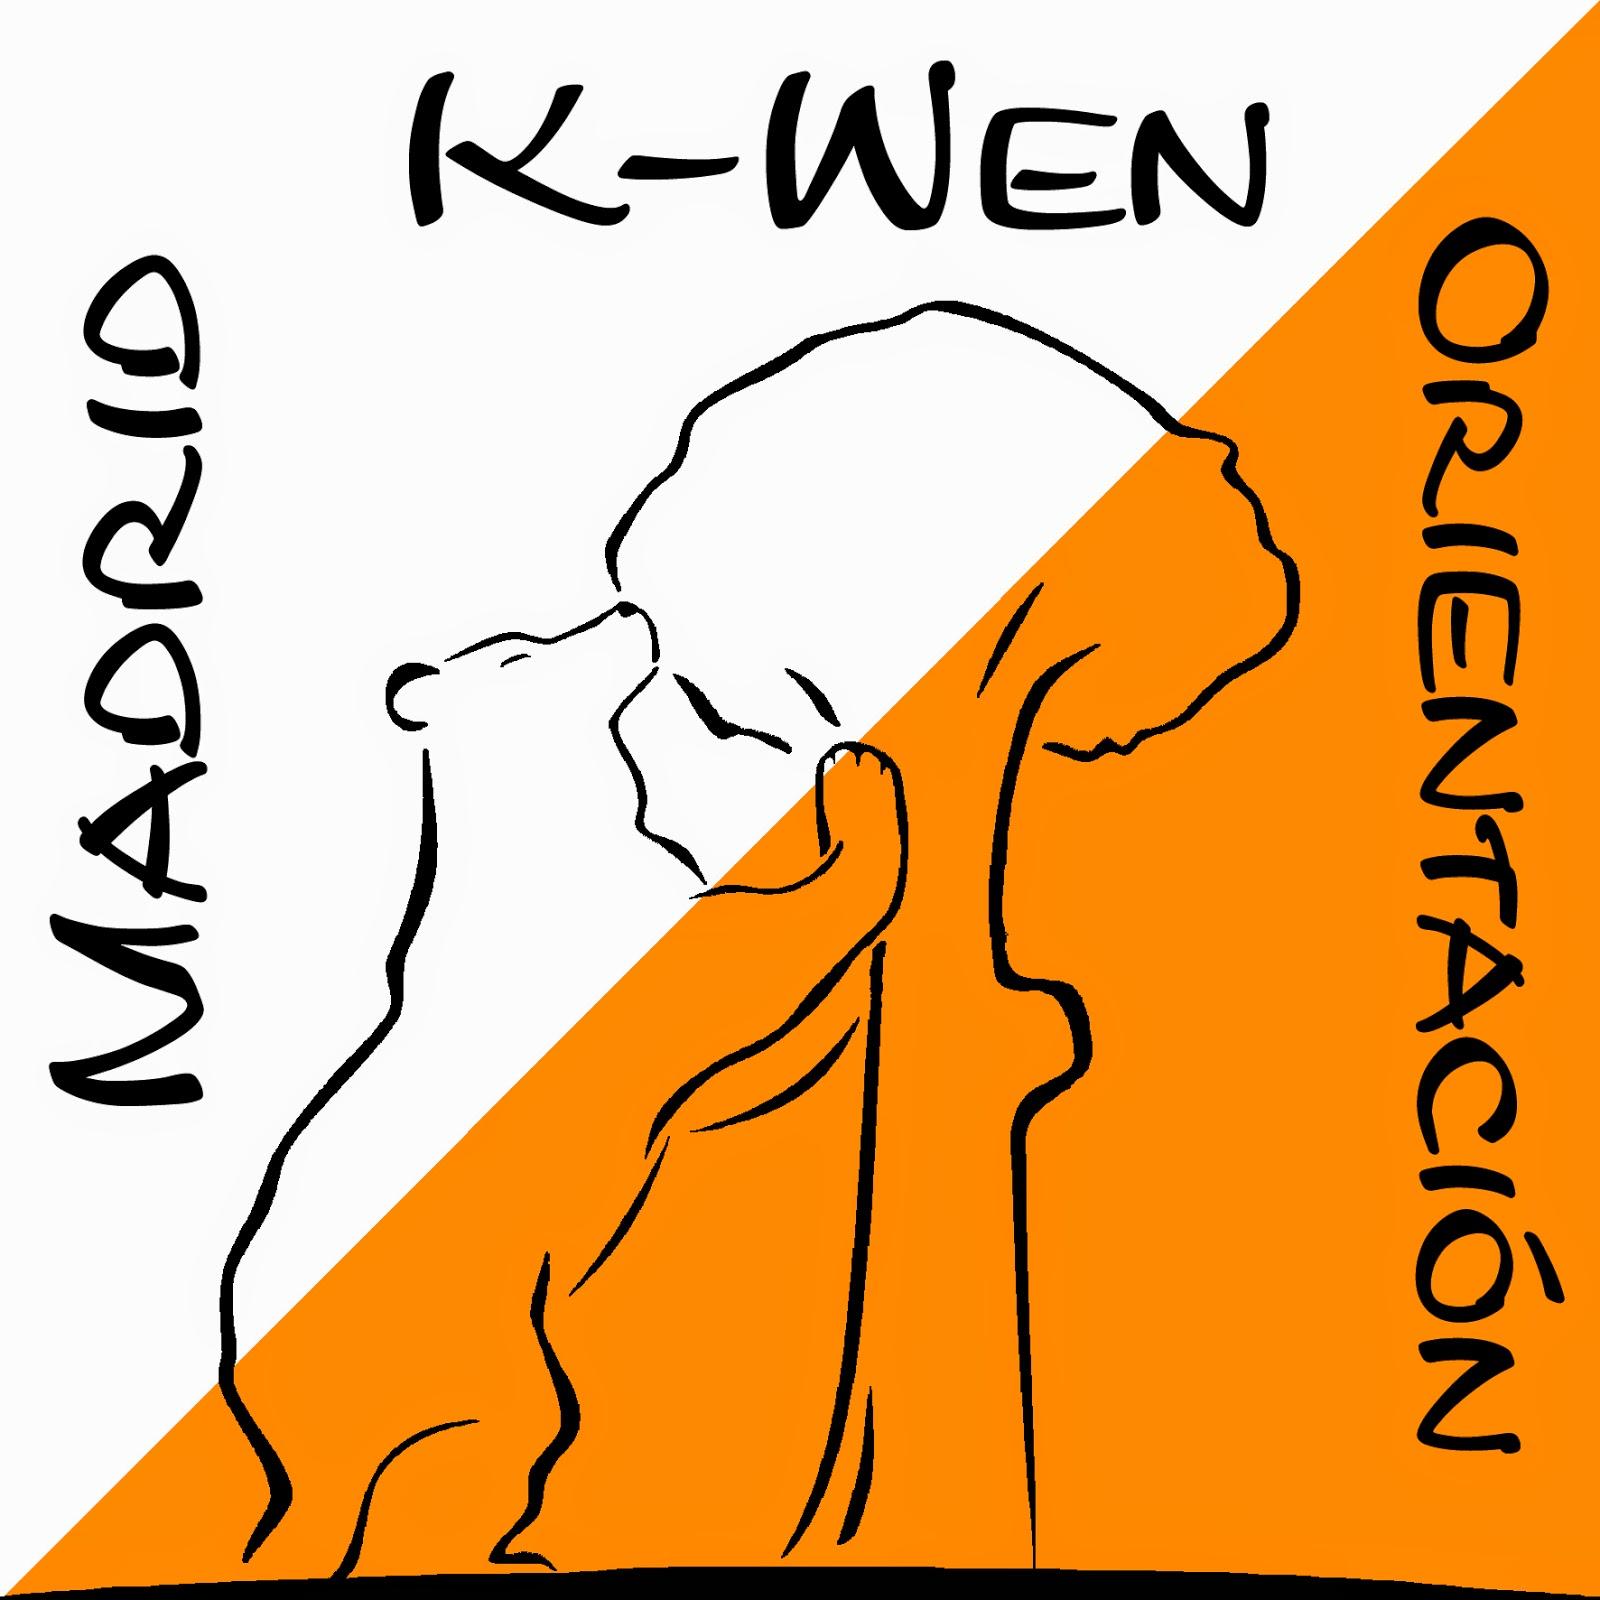 logo madrid k-wen orientacion